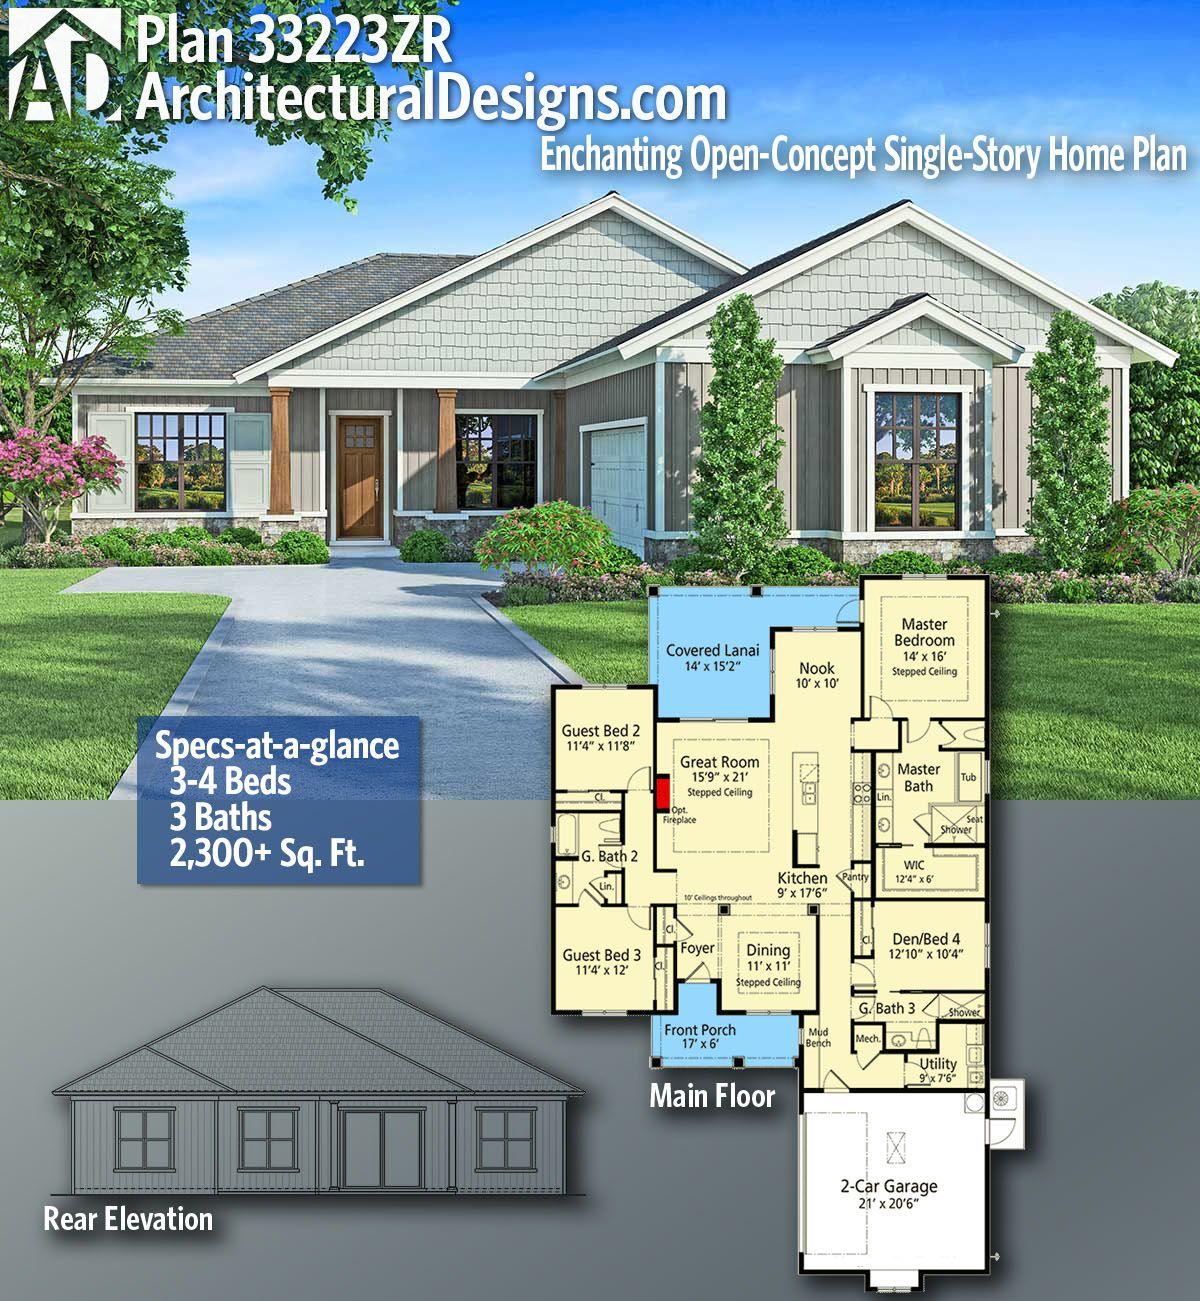 Plan 33223zr Enchanting Open Concept Single Story Home Plan House Plans Dream House Plans House Blueprints